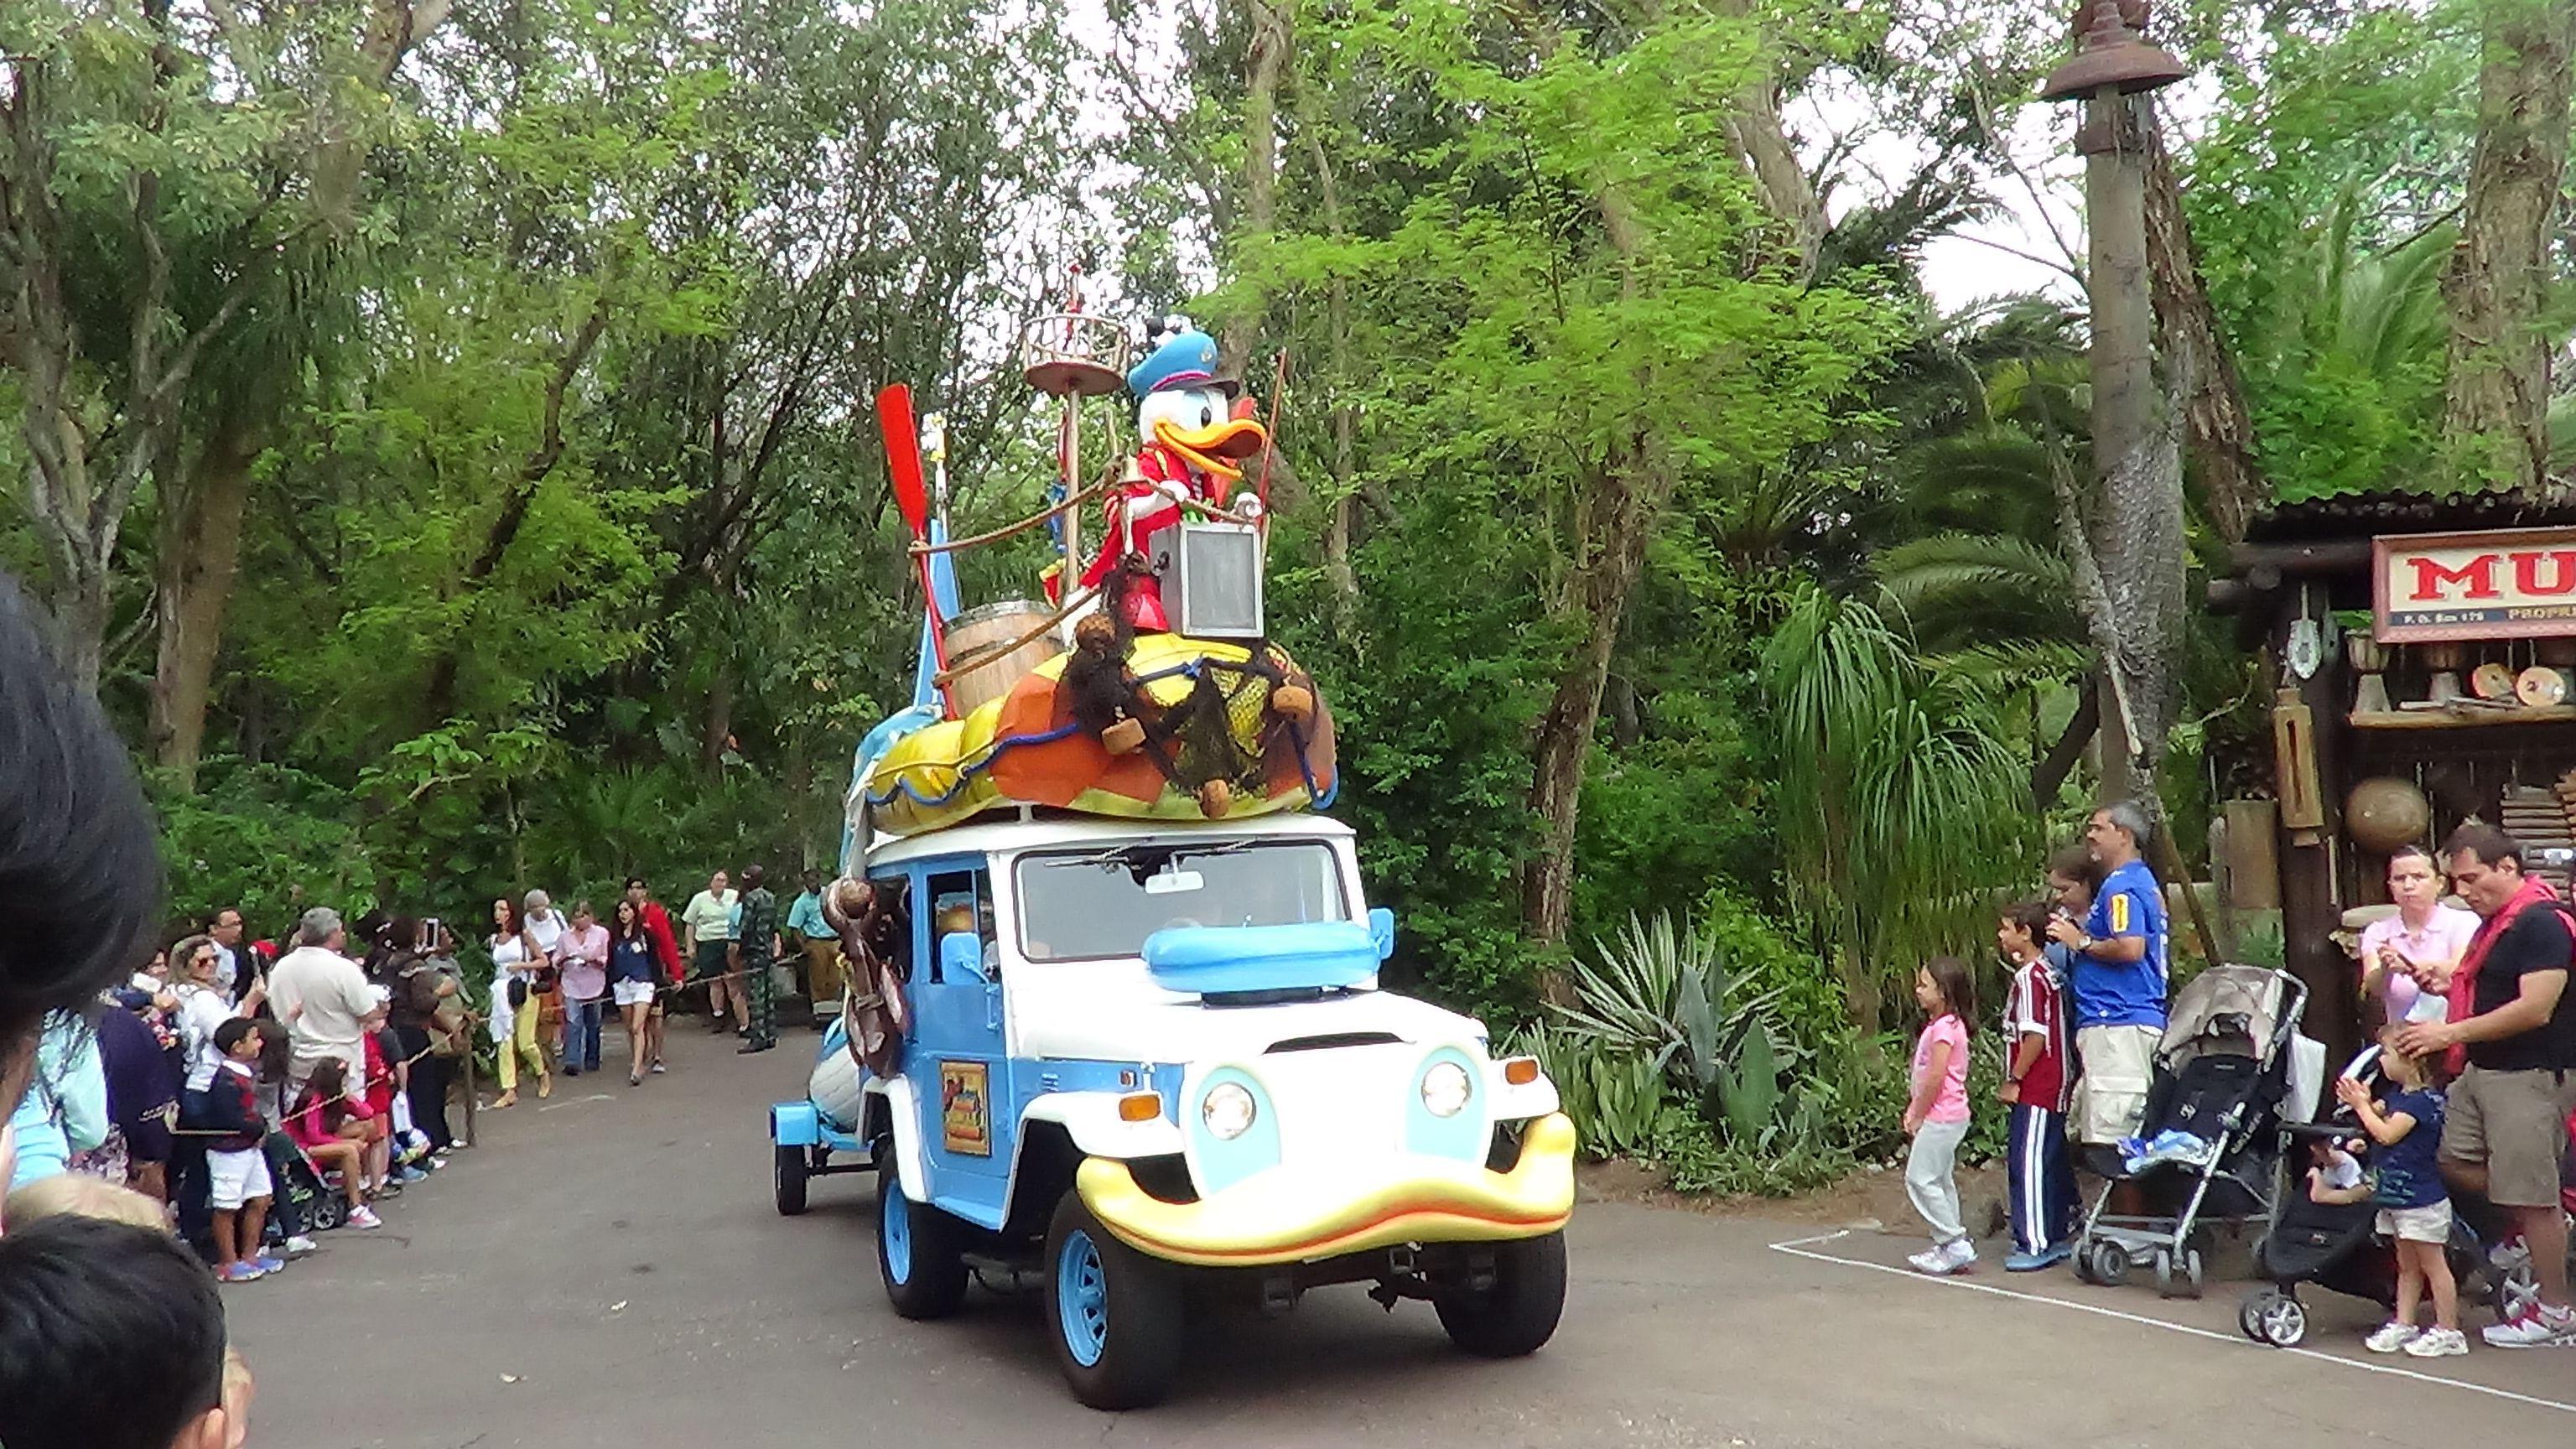 Junglejamminparade Animalkingdomparade Cars Certainly Look Like